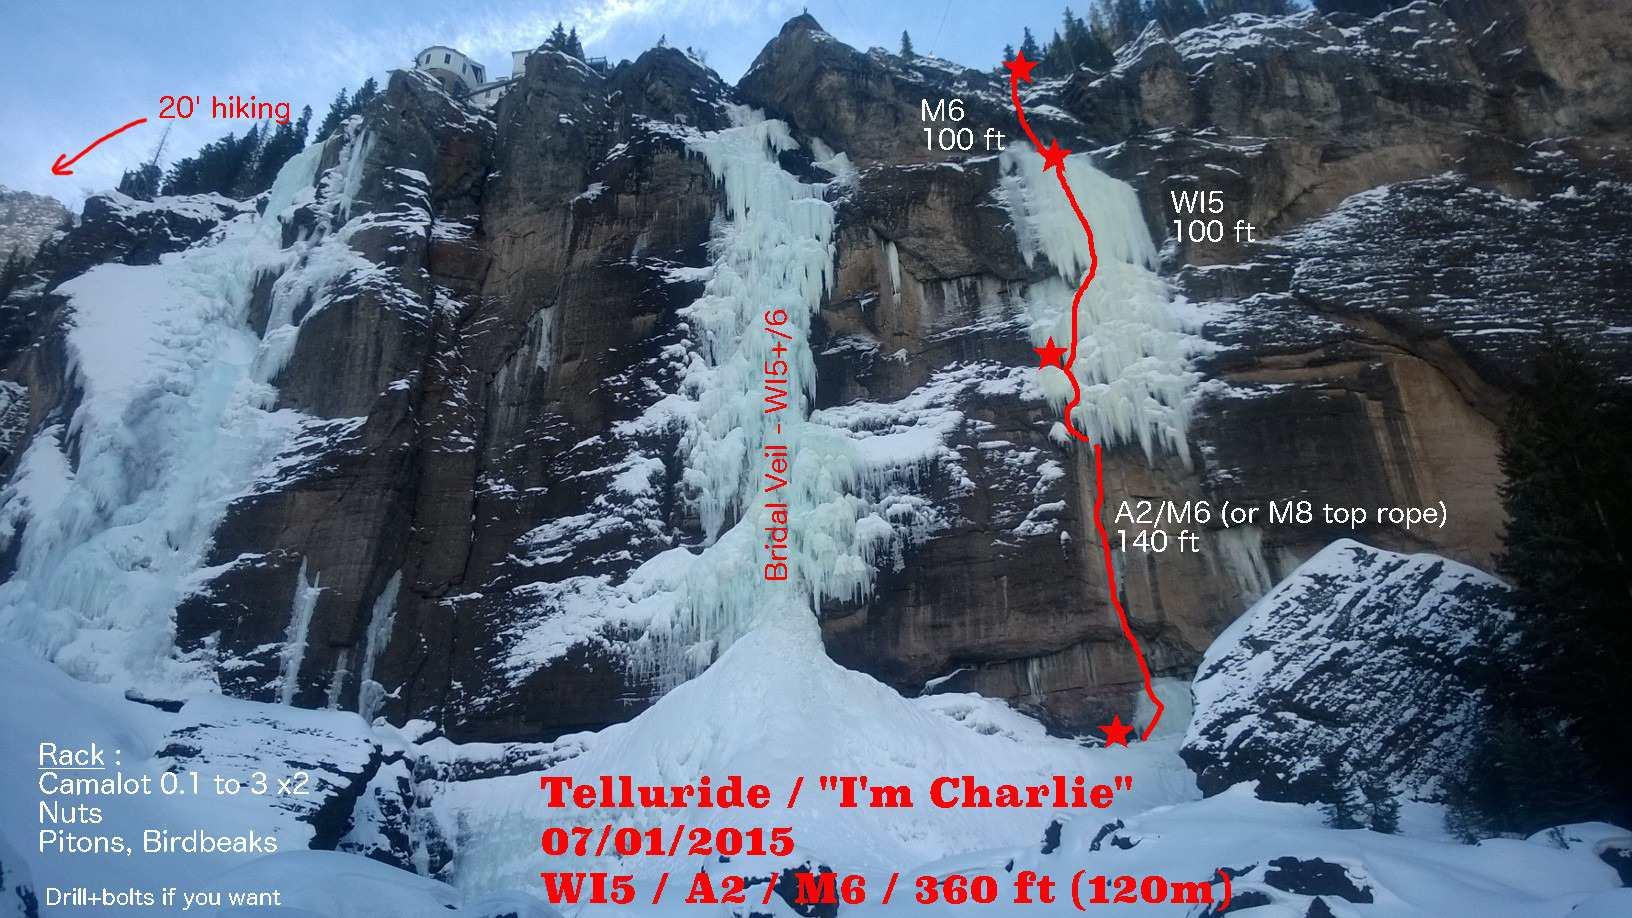 Climbing Colorado Ice, French Style